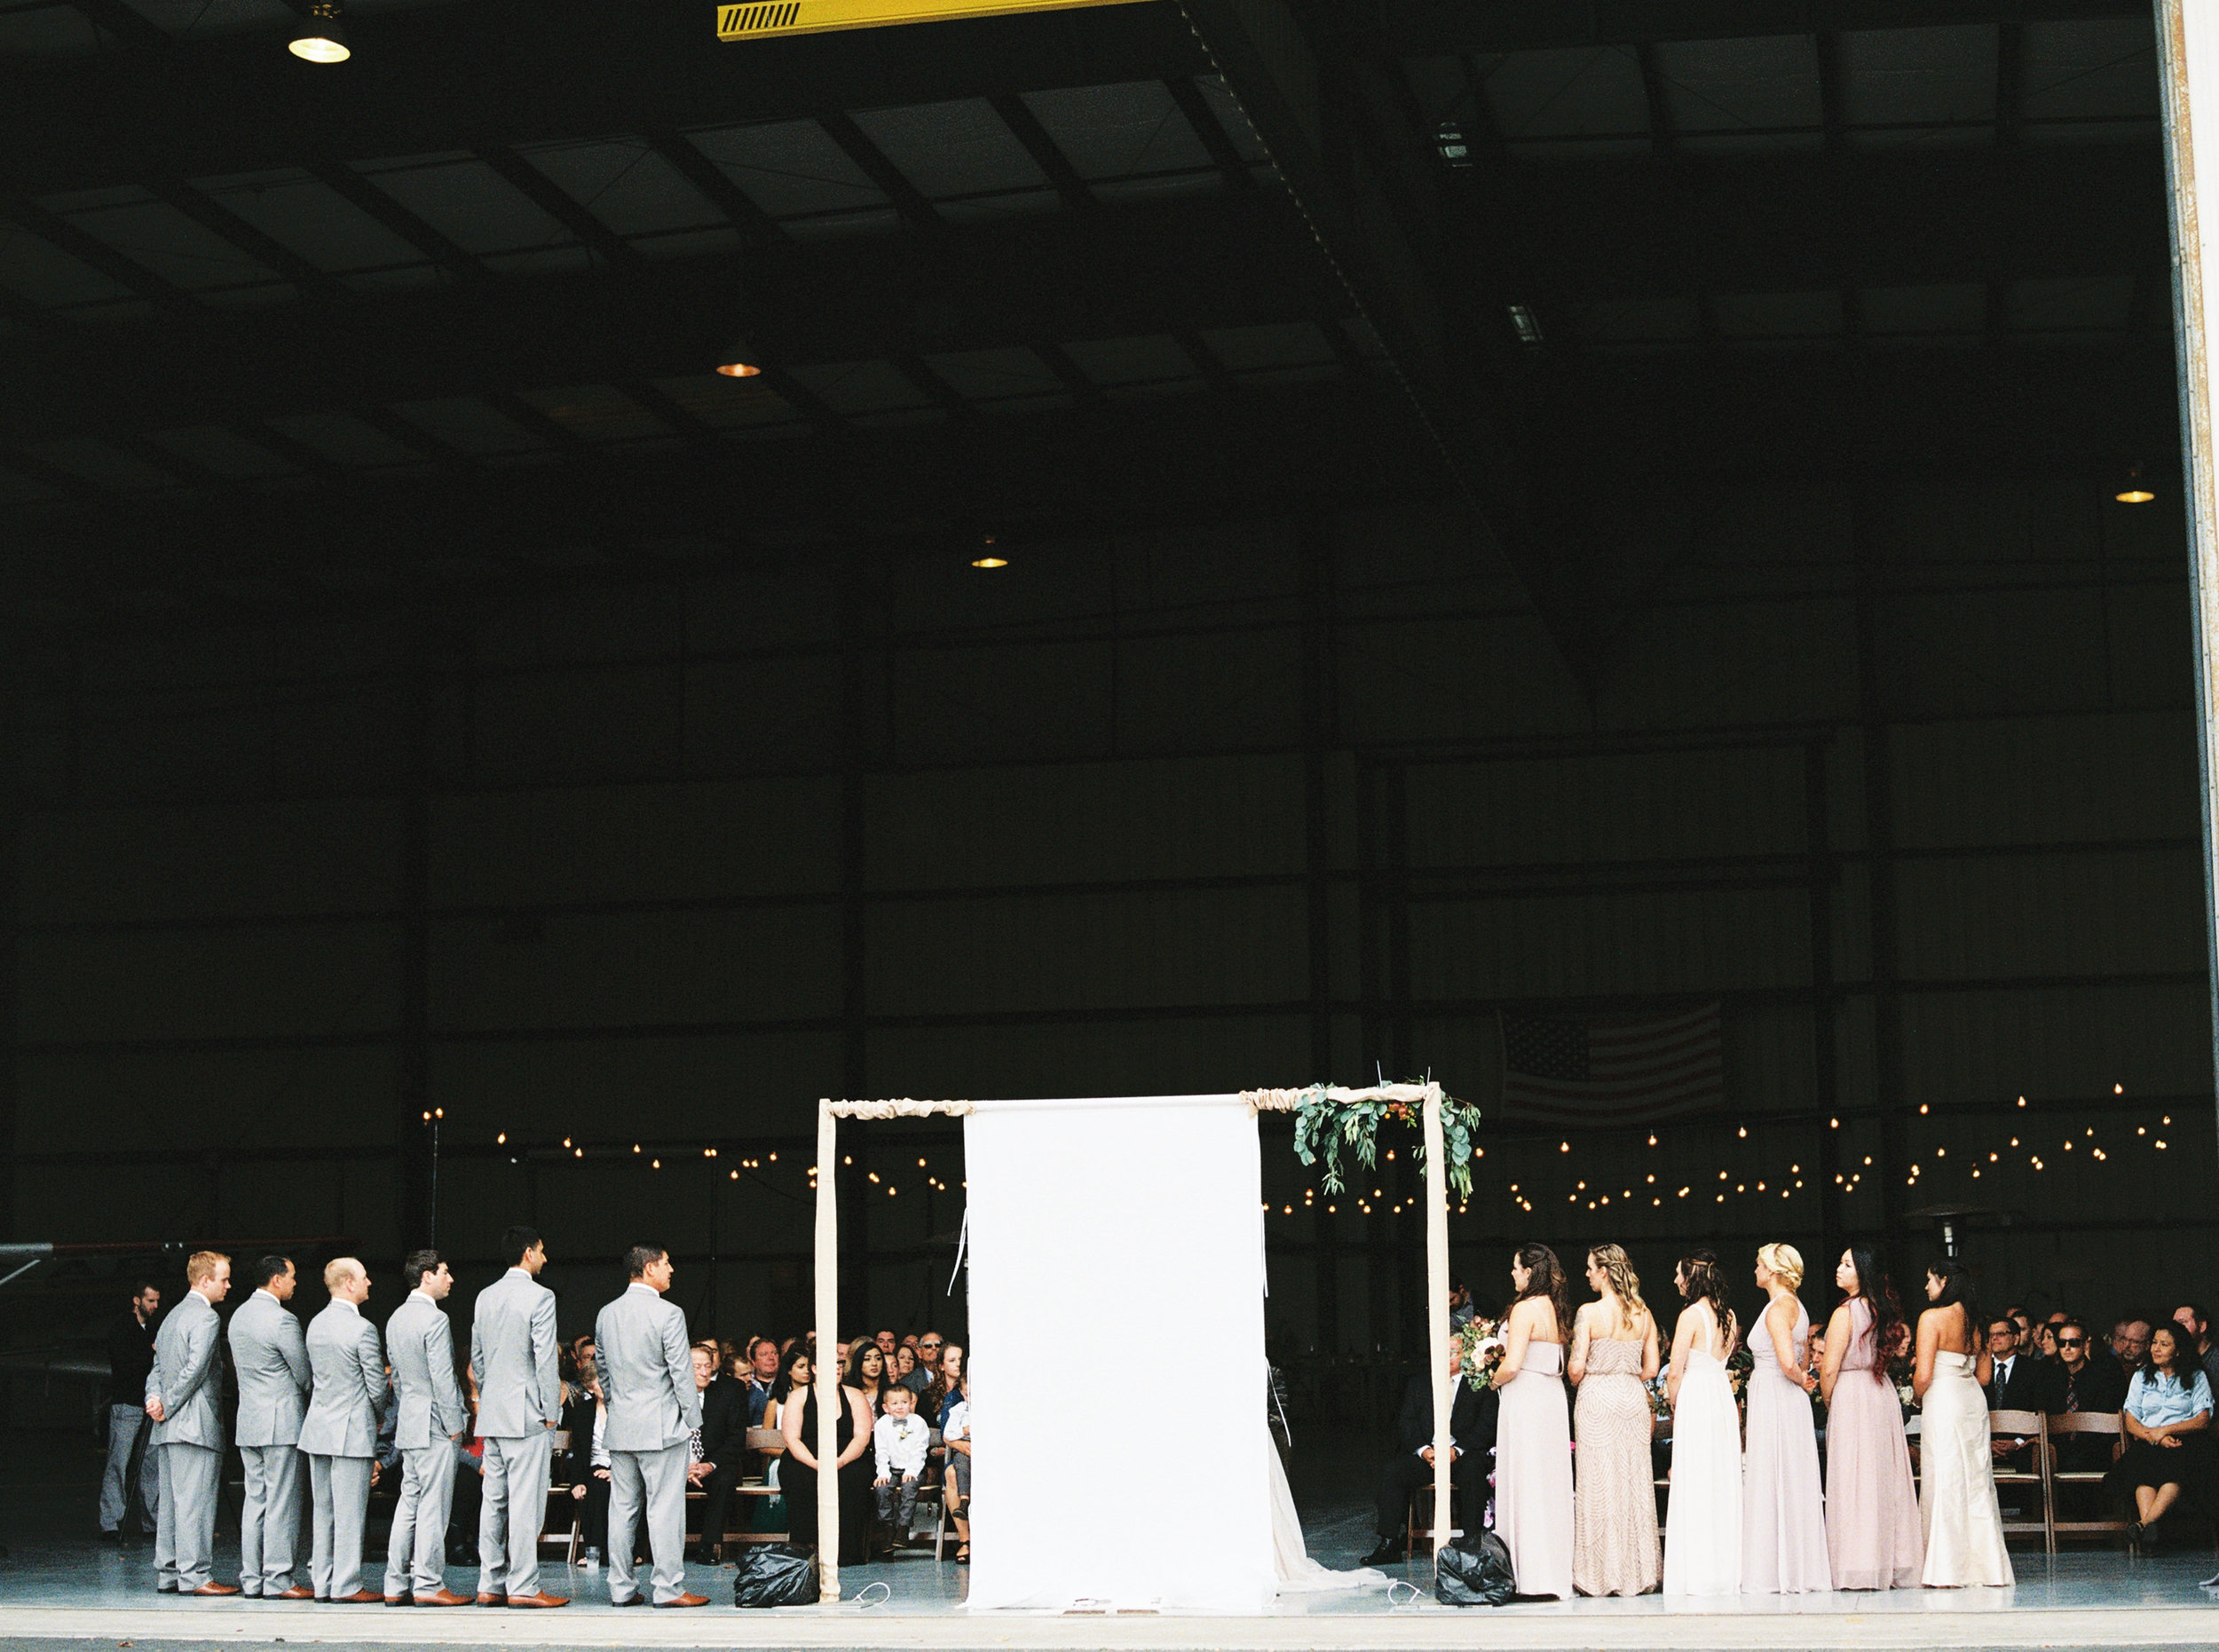 airport-hanger-wedding-at-attitude-aviation-in-livermore-66-2.jpg